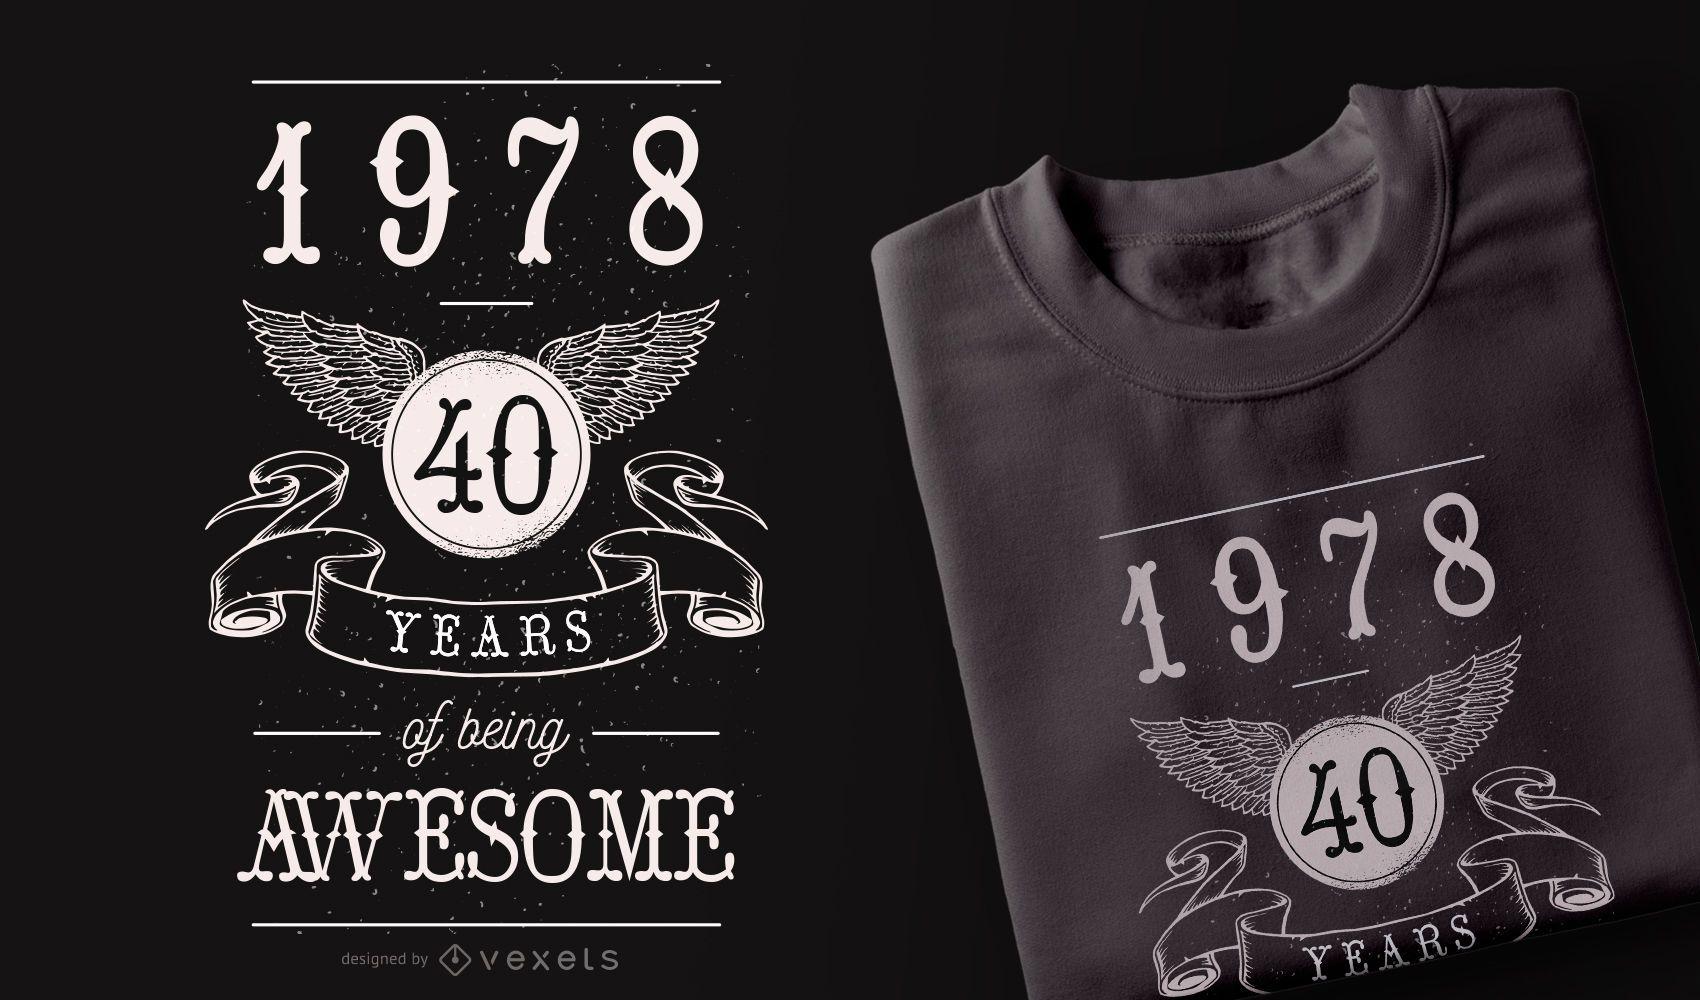 40 Years Awesome diseño de camiseta